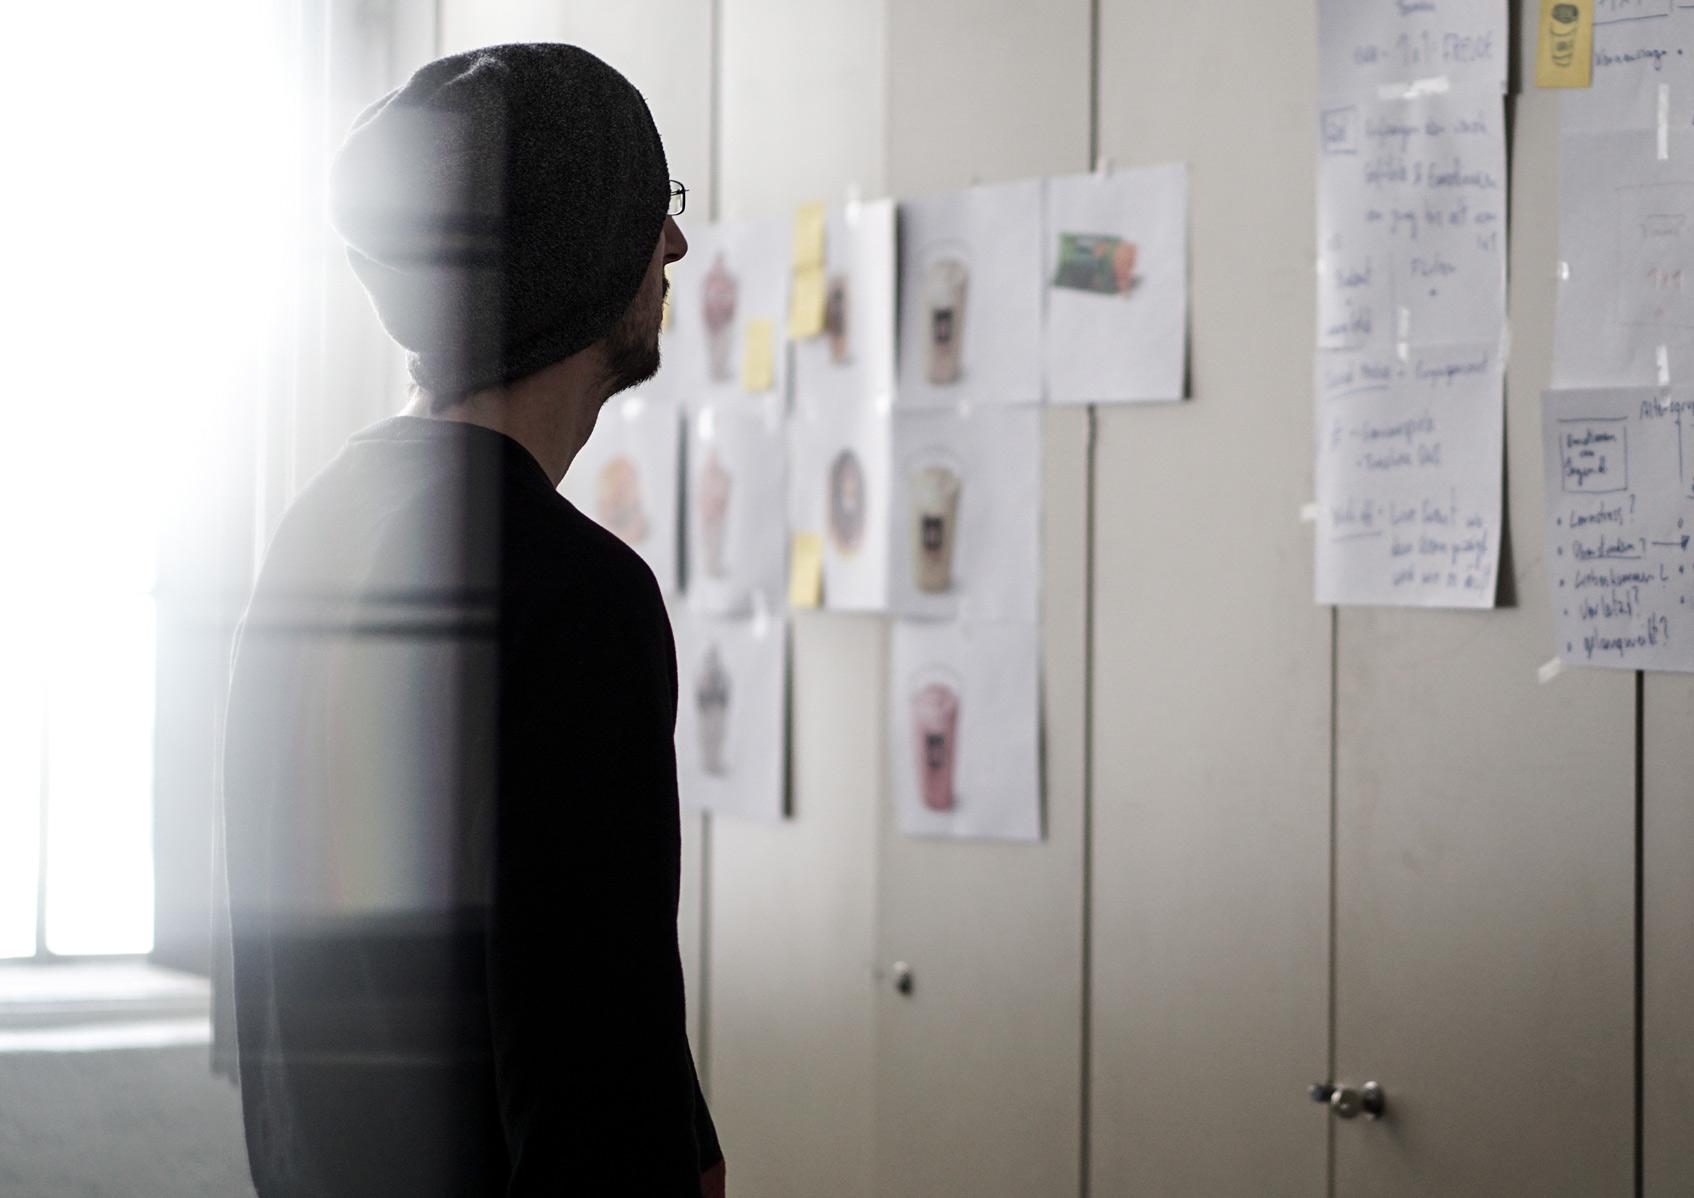 мужчина смотрит на стену